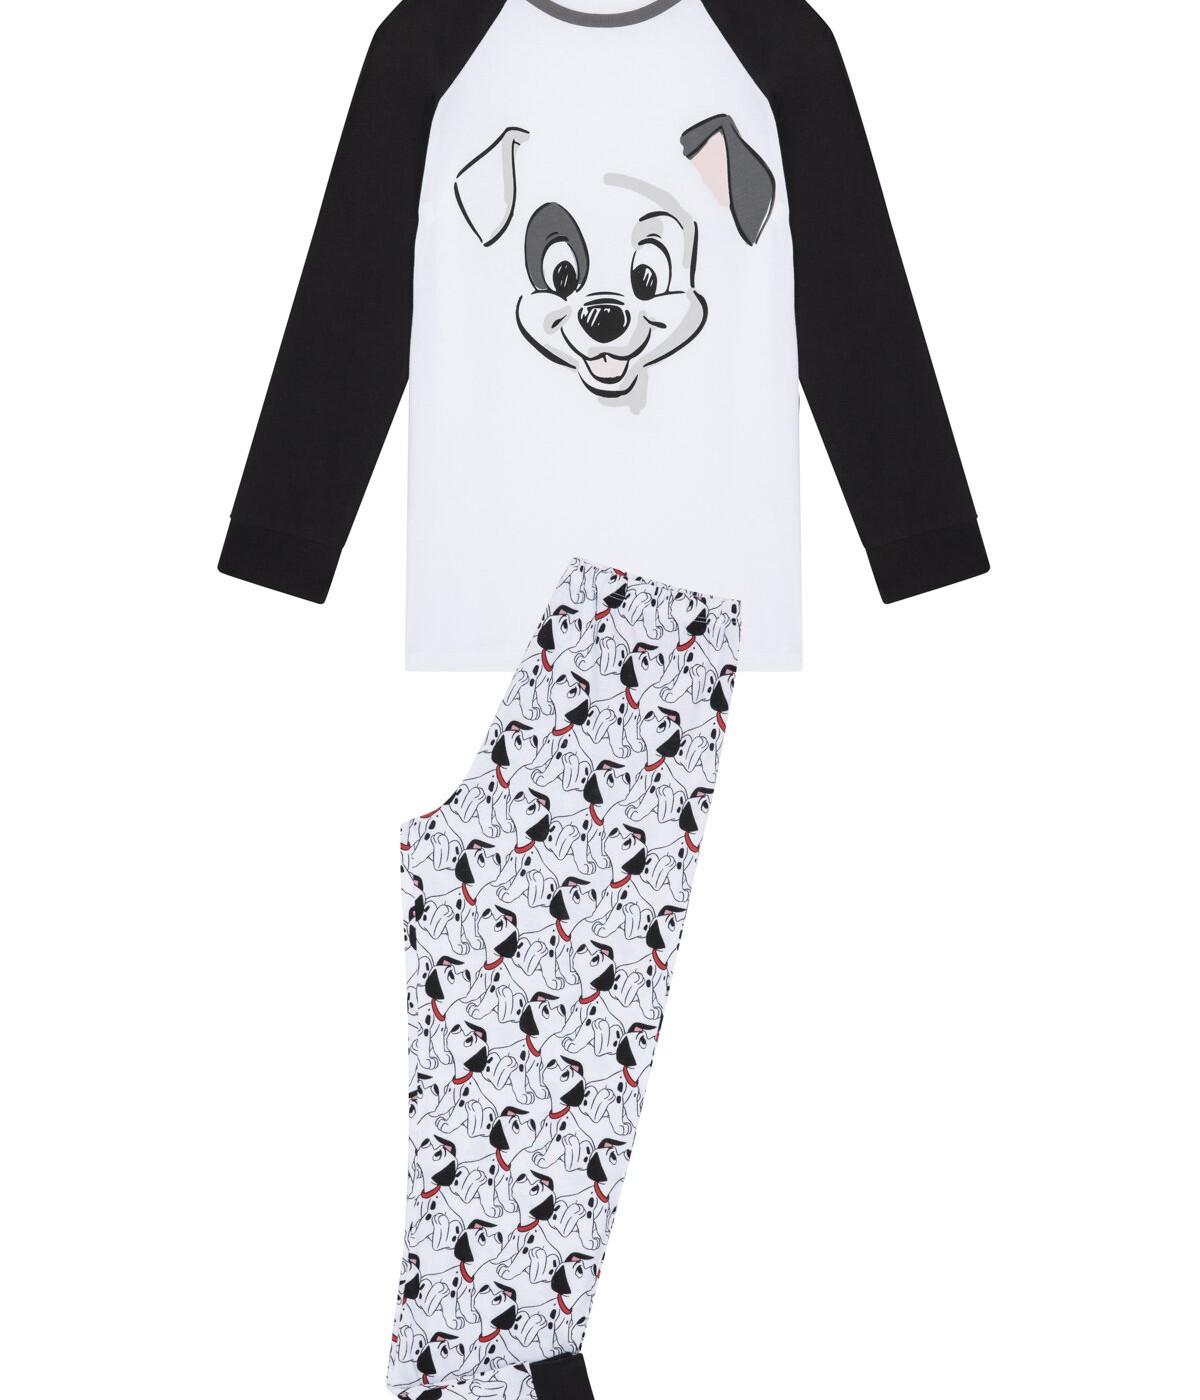 Boy Child Disney Dalmatian 2 In 1 PJ Set